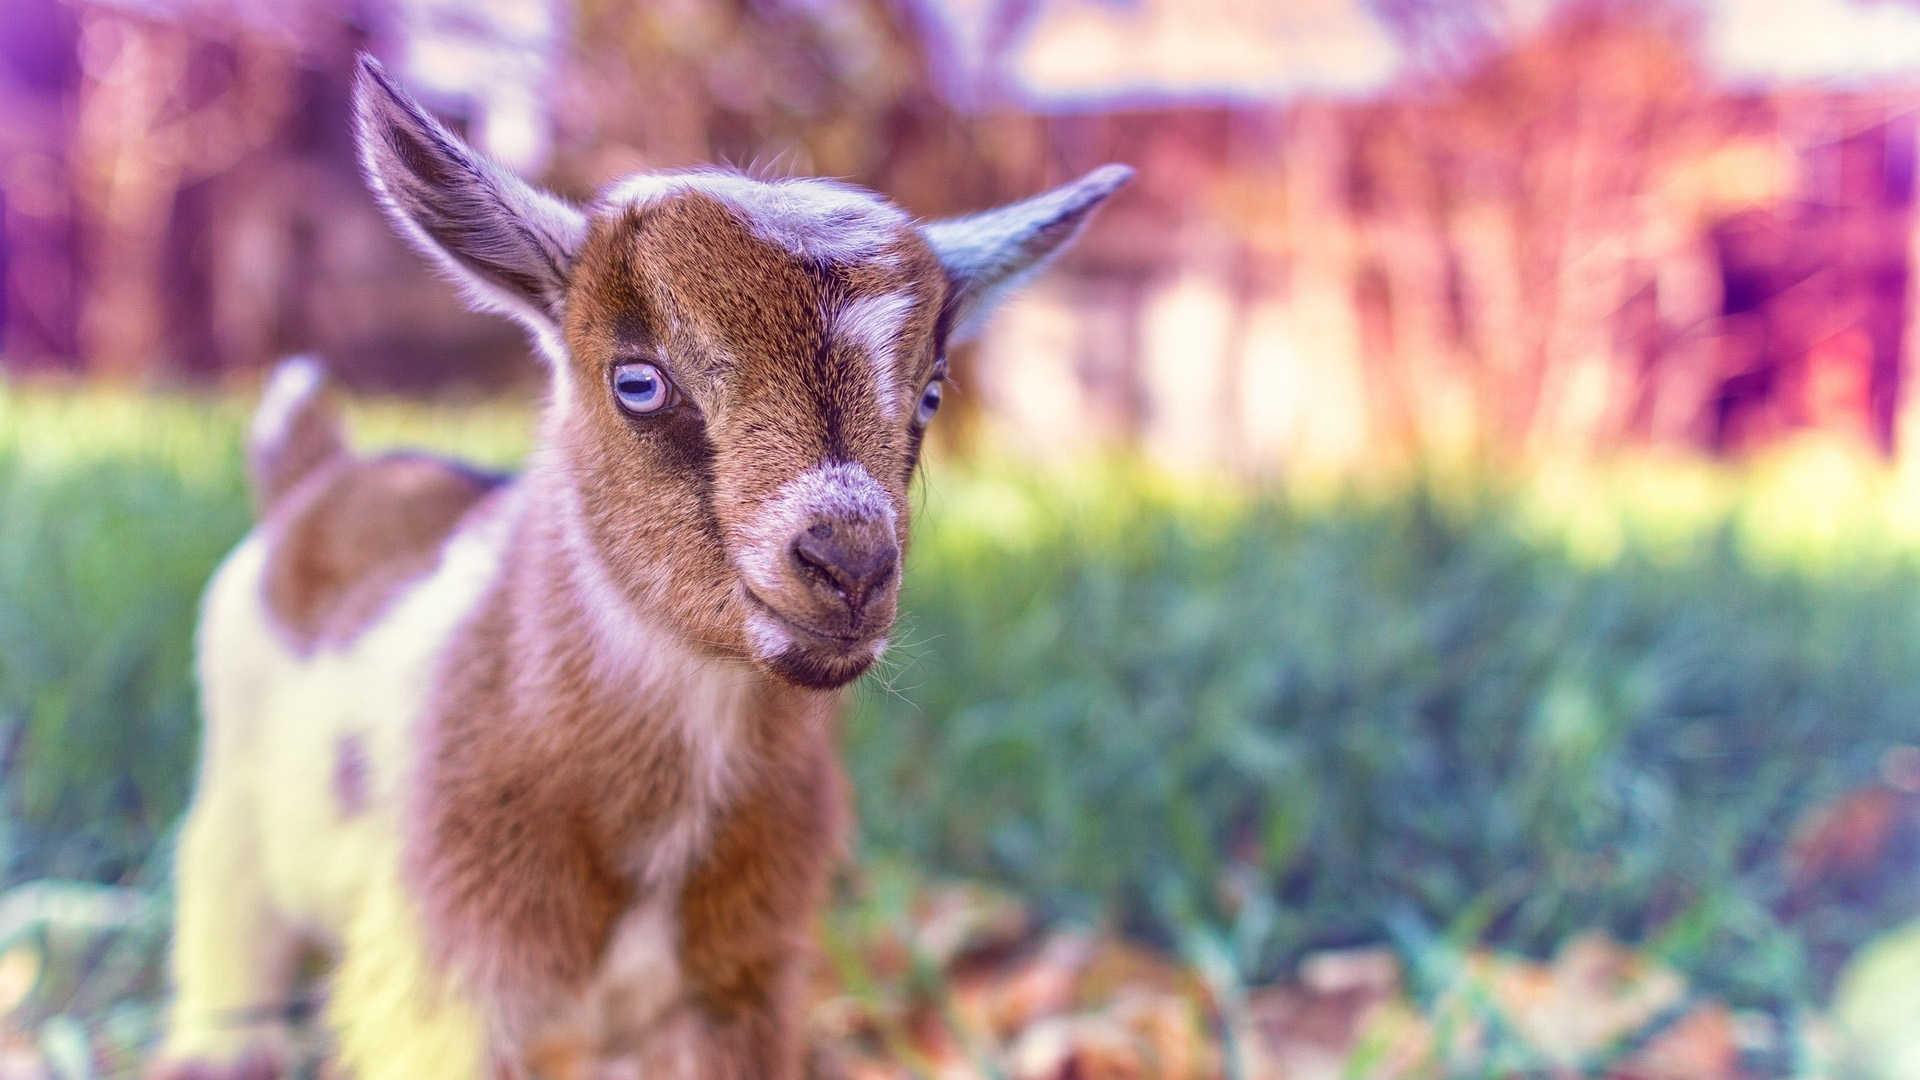 goat desktop hd wallpaper 62335